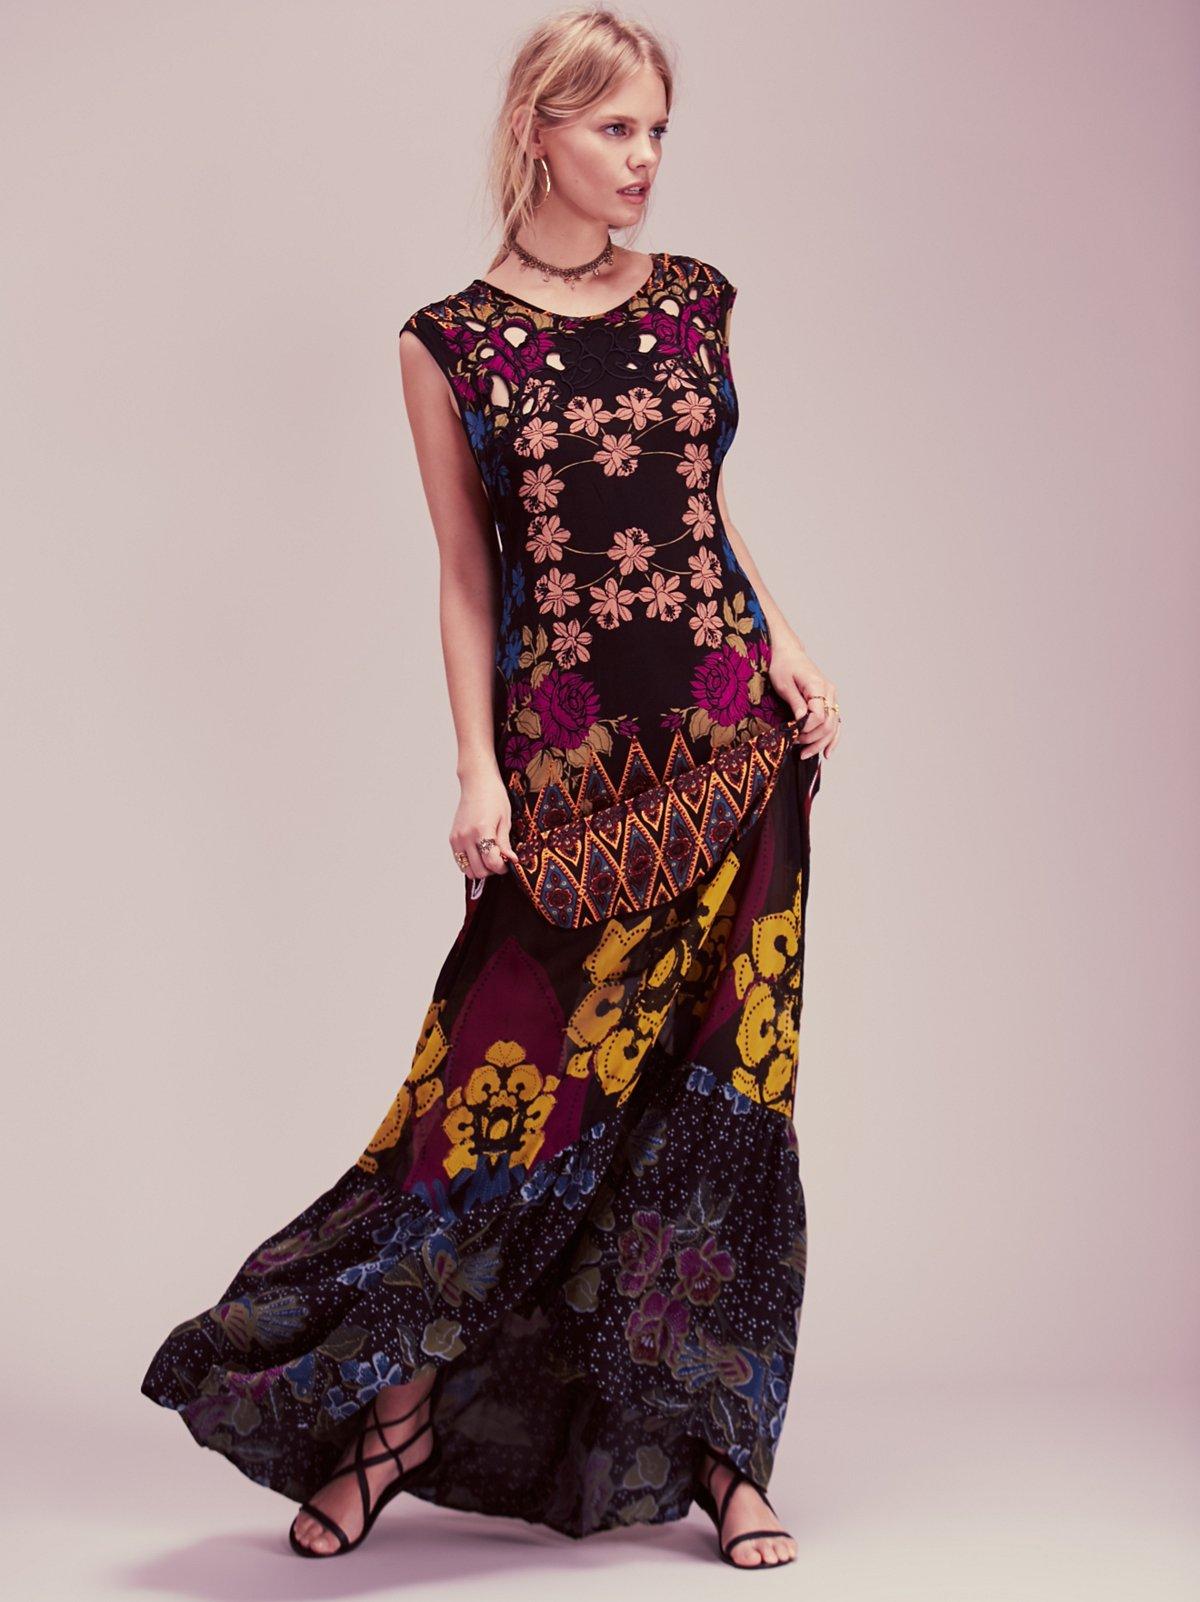 Bali Bali Dress